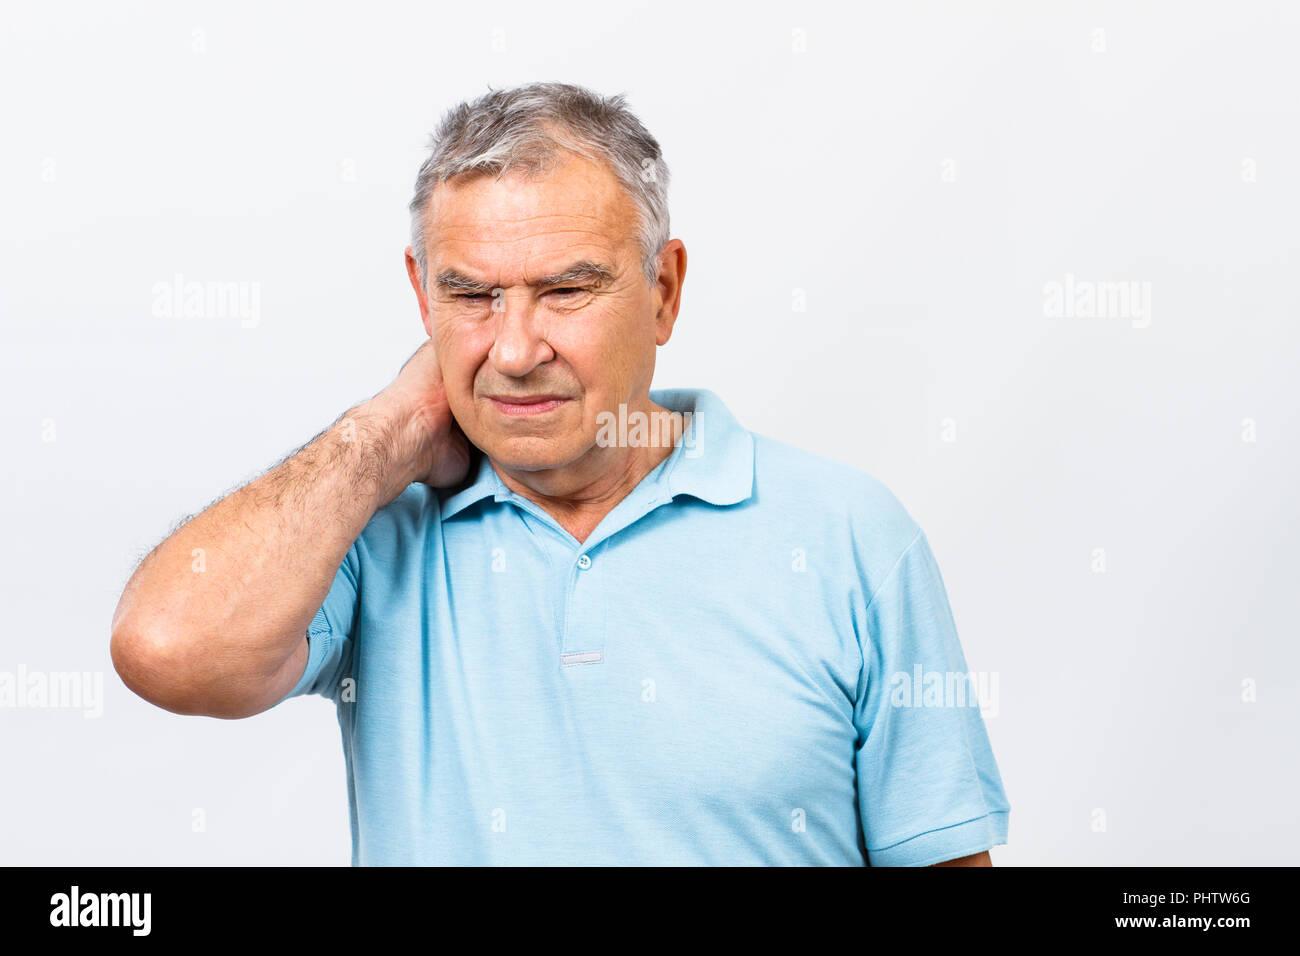 Neck pain - Stock Image